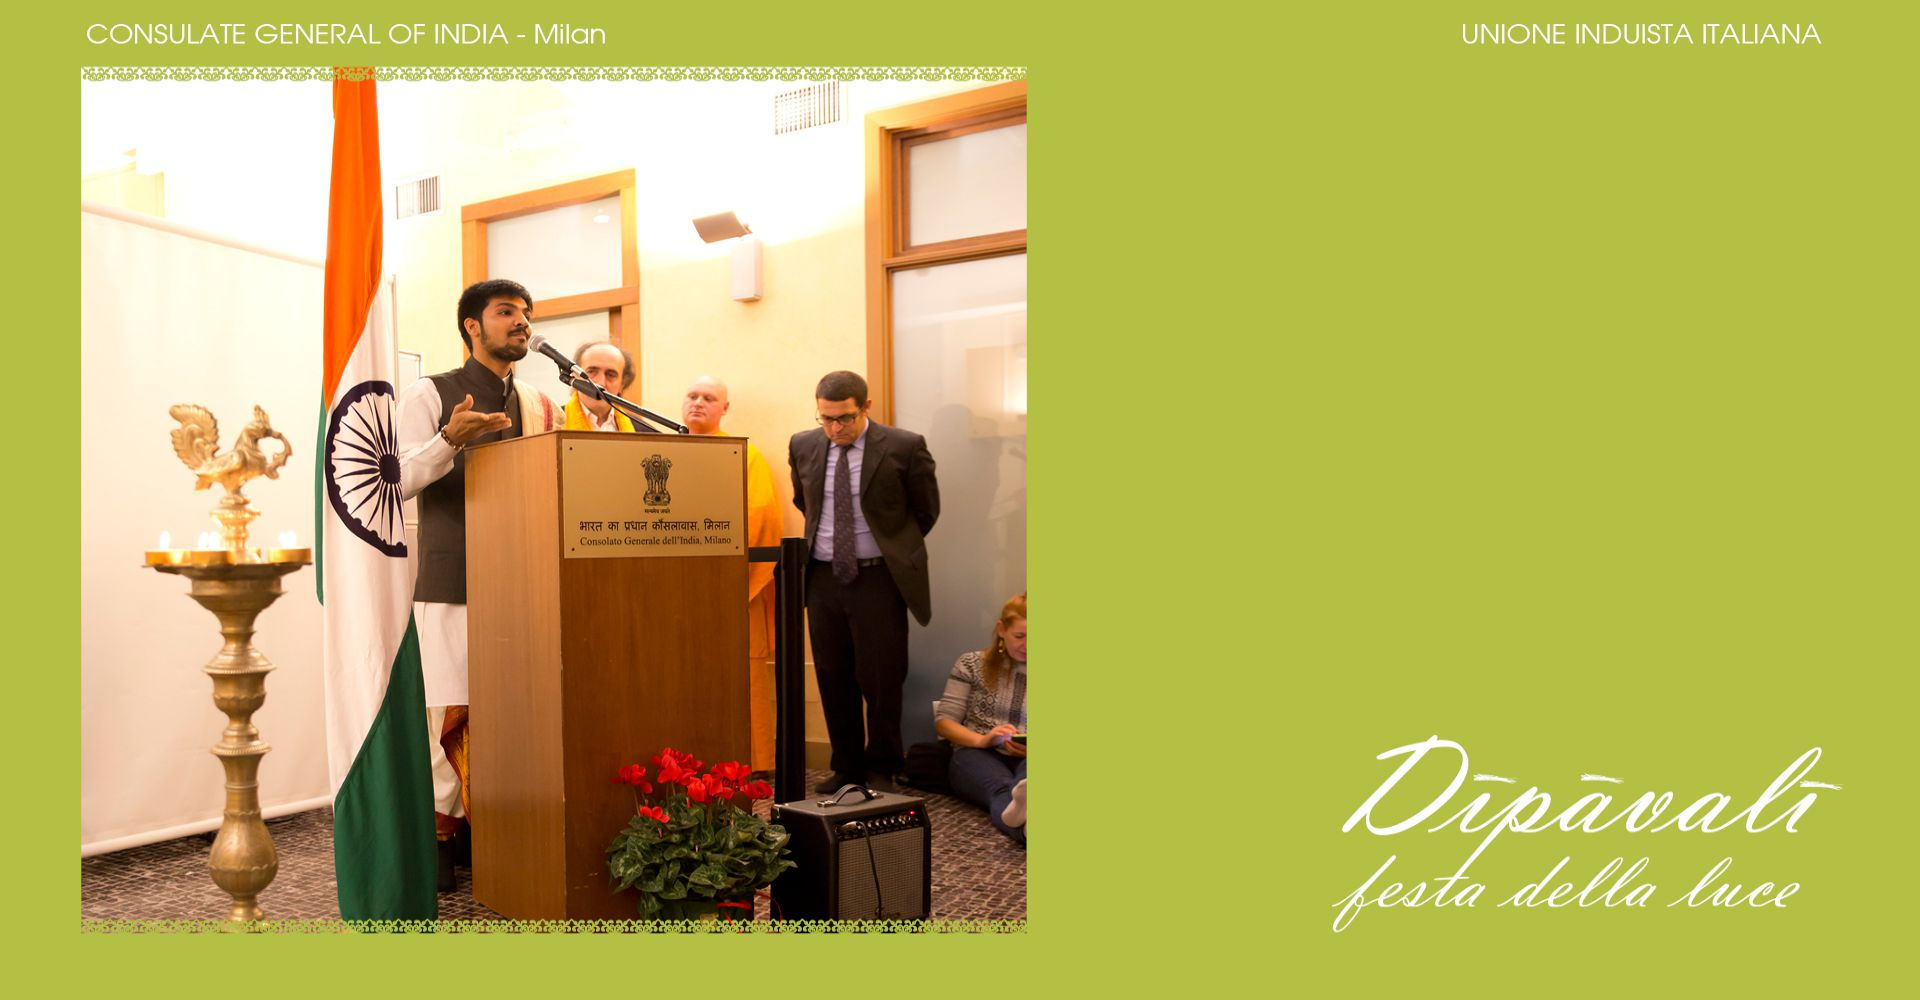 dipavali-consulate3158